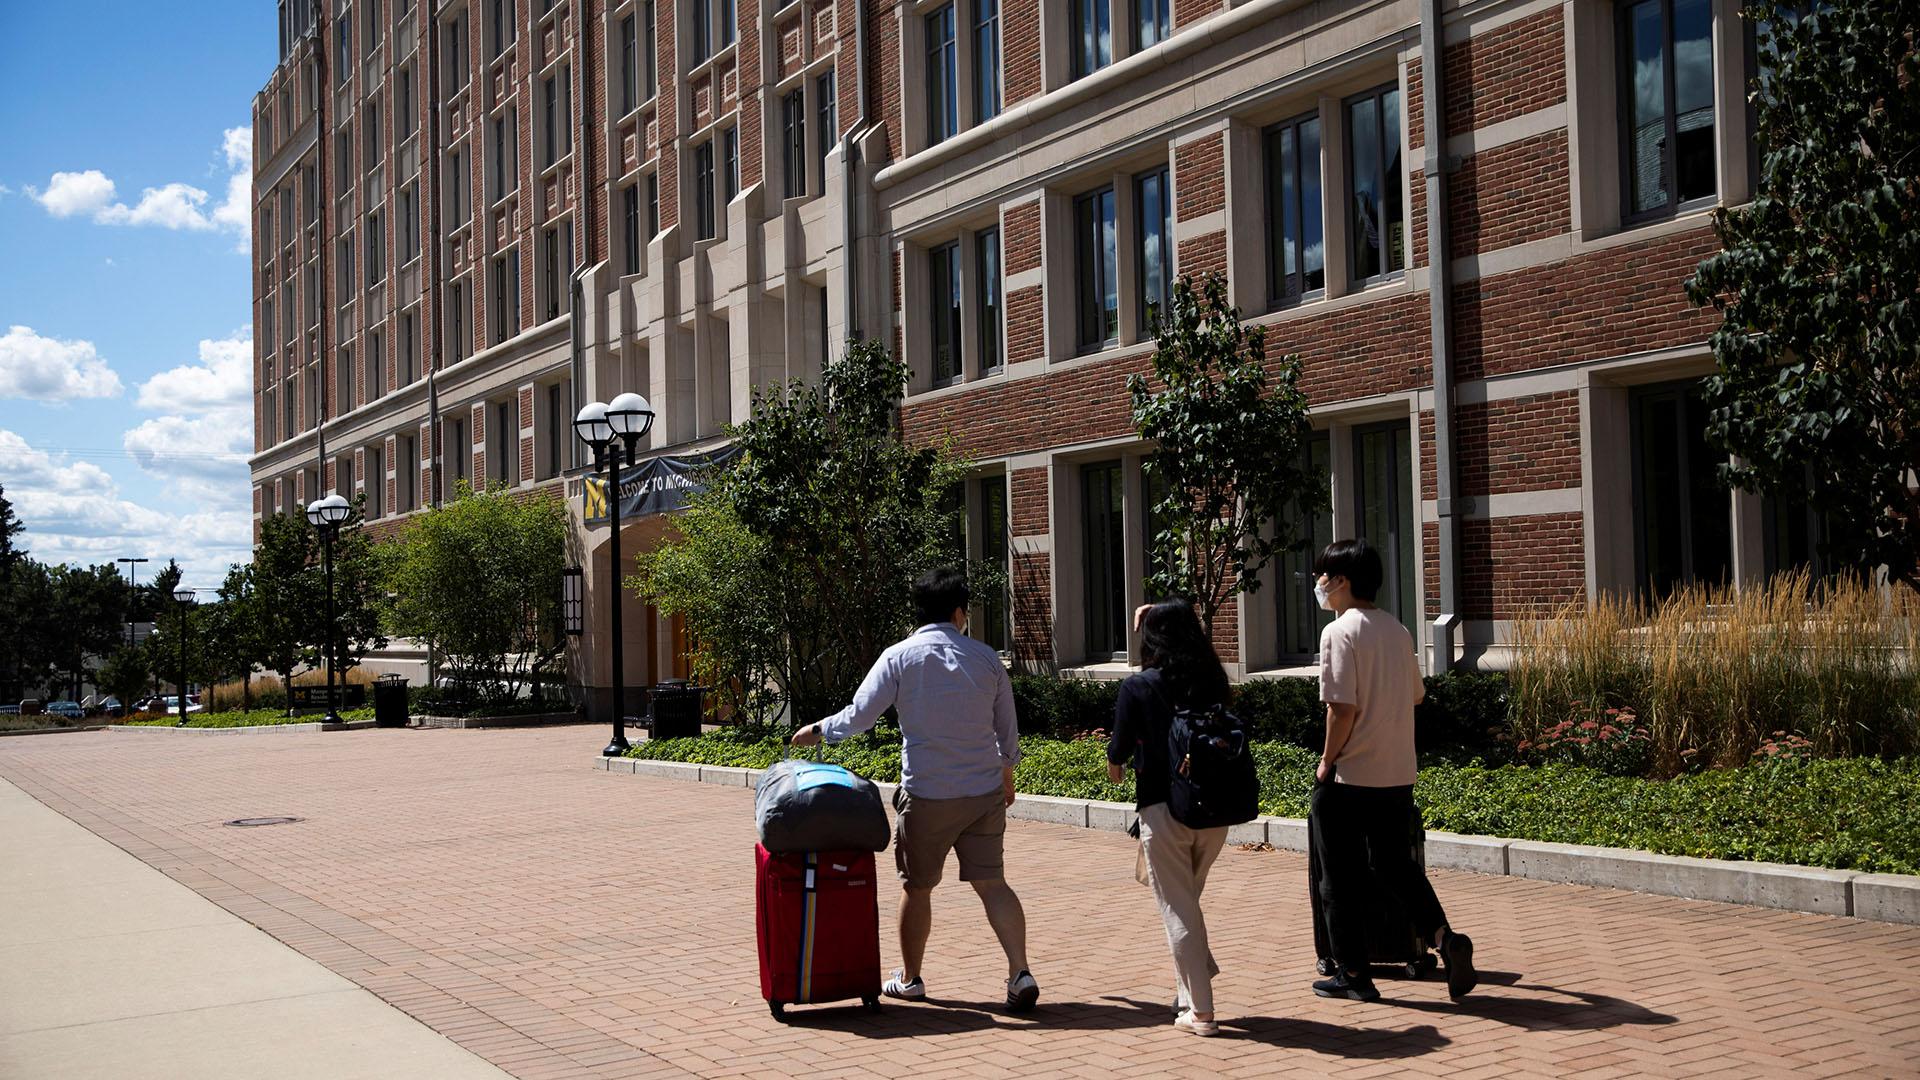 US universities see rise in coronavirus cases as schools reopen